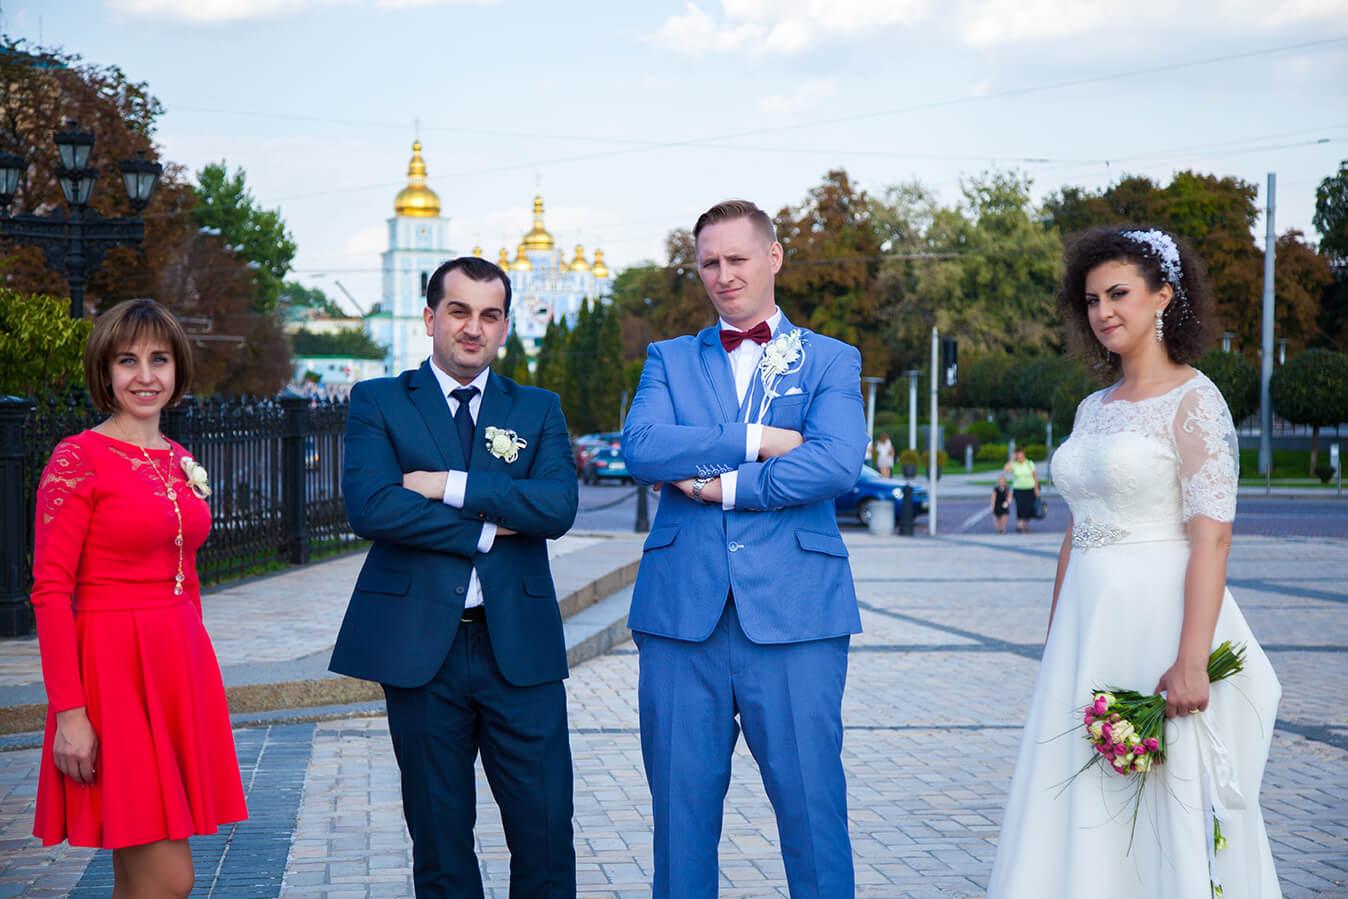 3-svadebnyj-fotograf-videooperator-svadebnoe-foto-idei-kiev-9